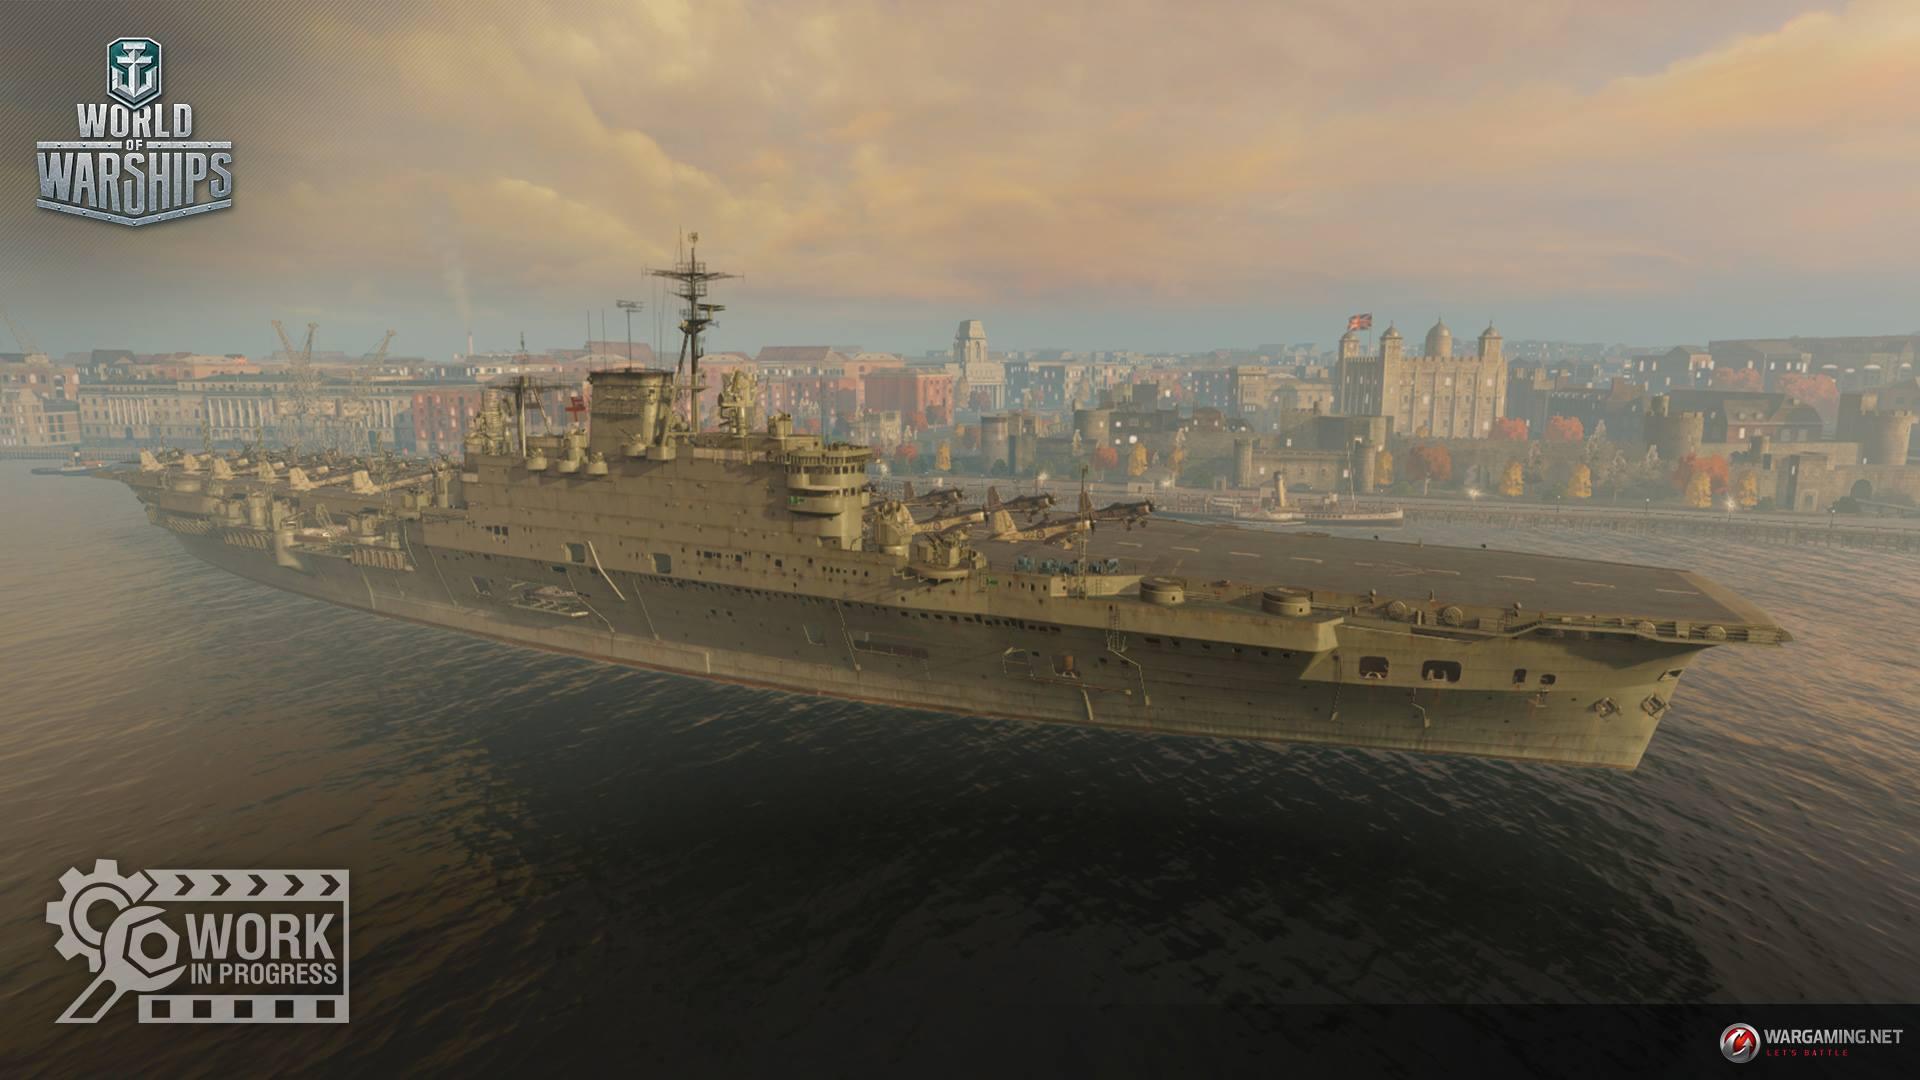 HMSAudaciousT10.jpg